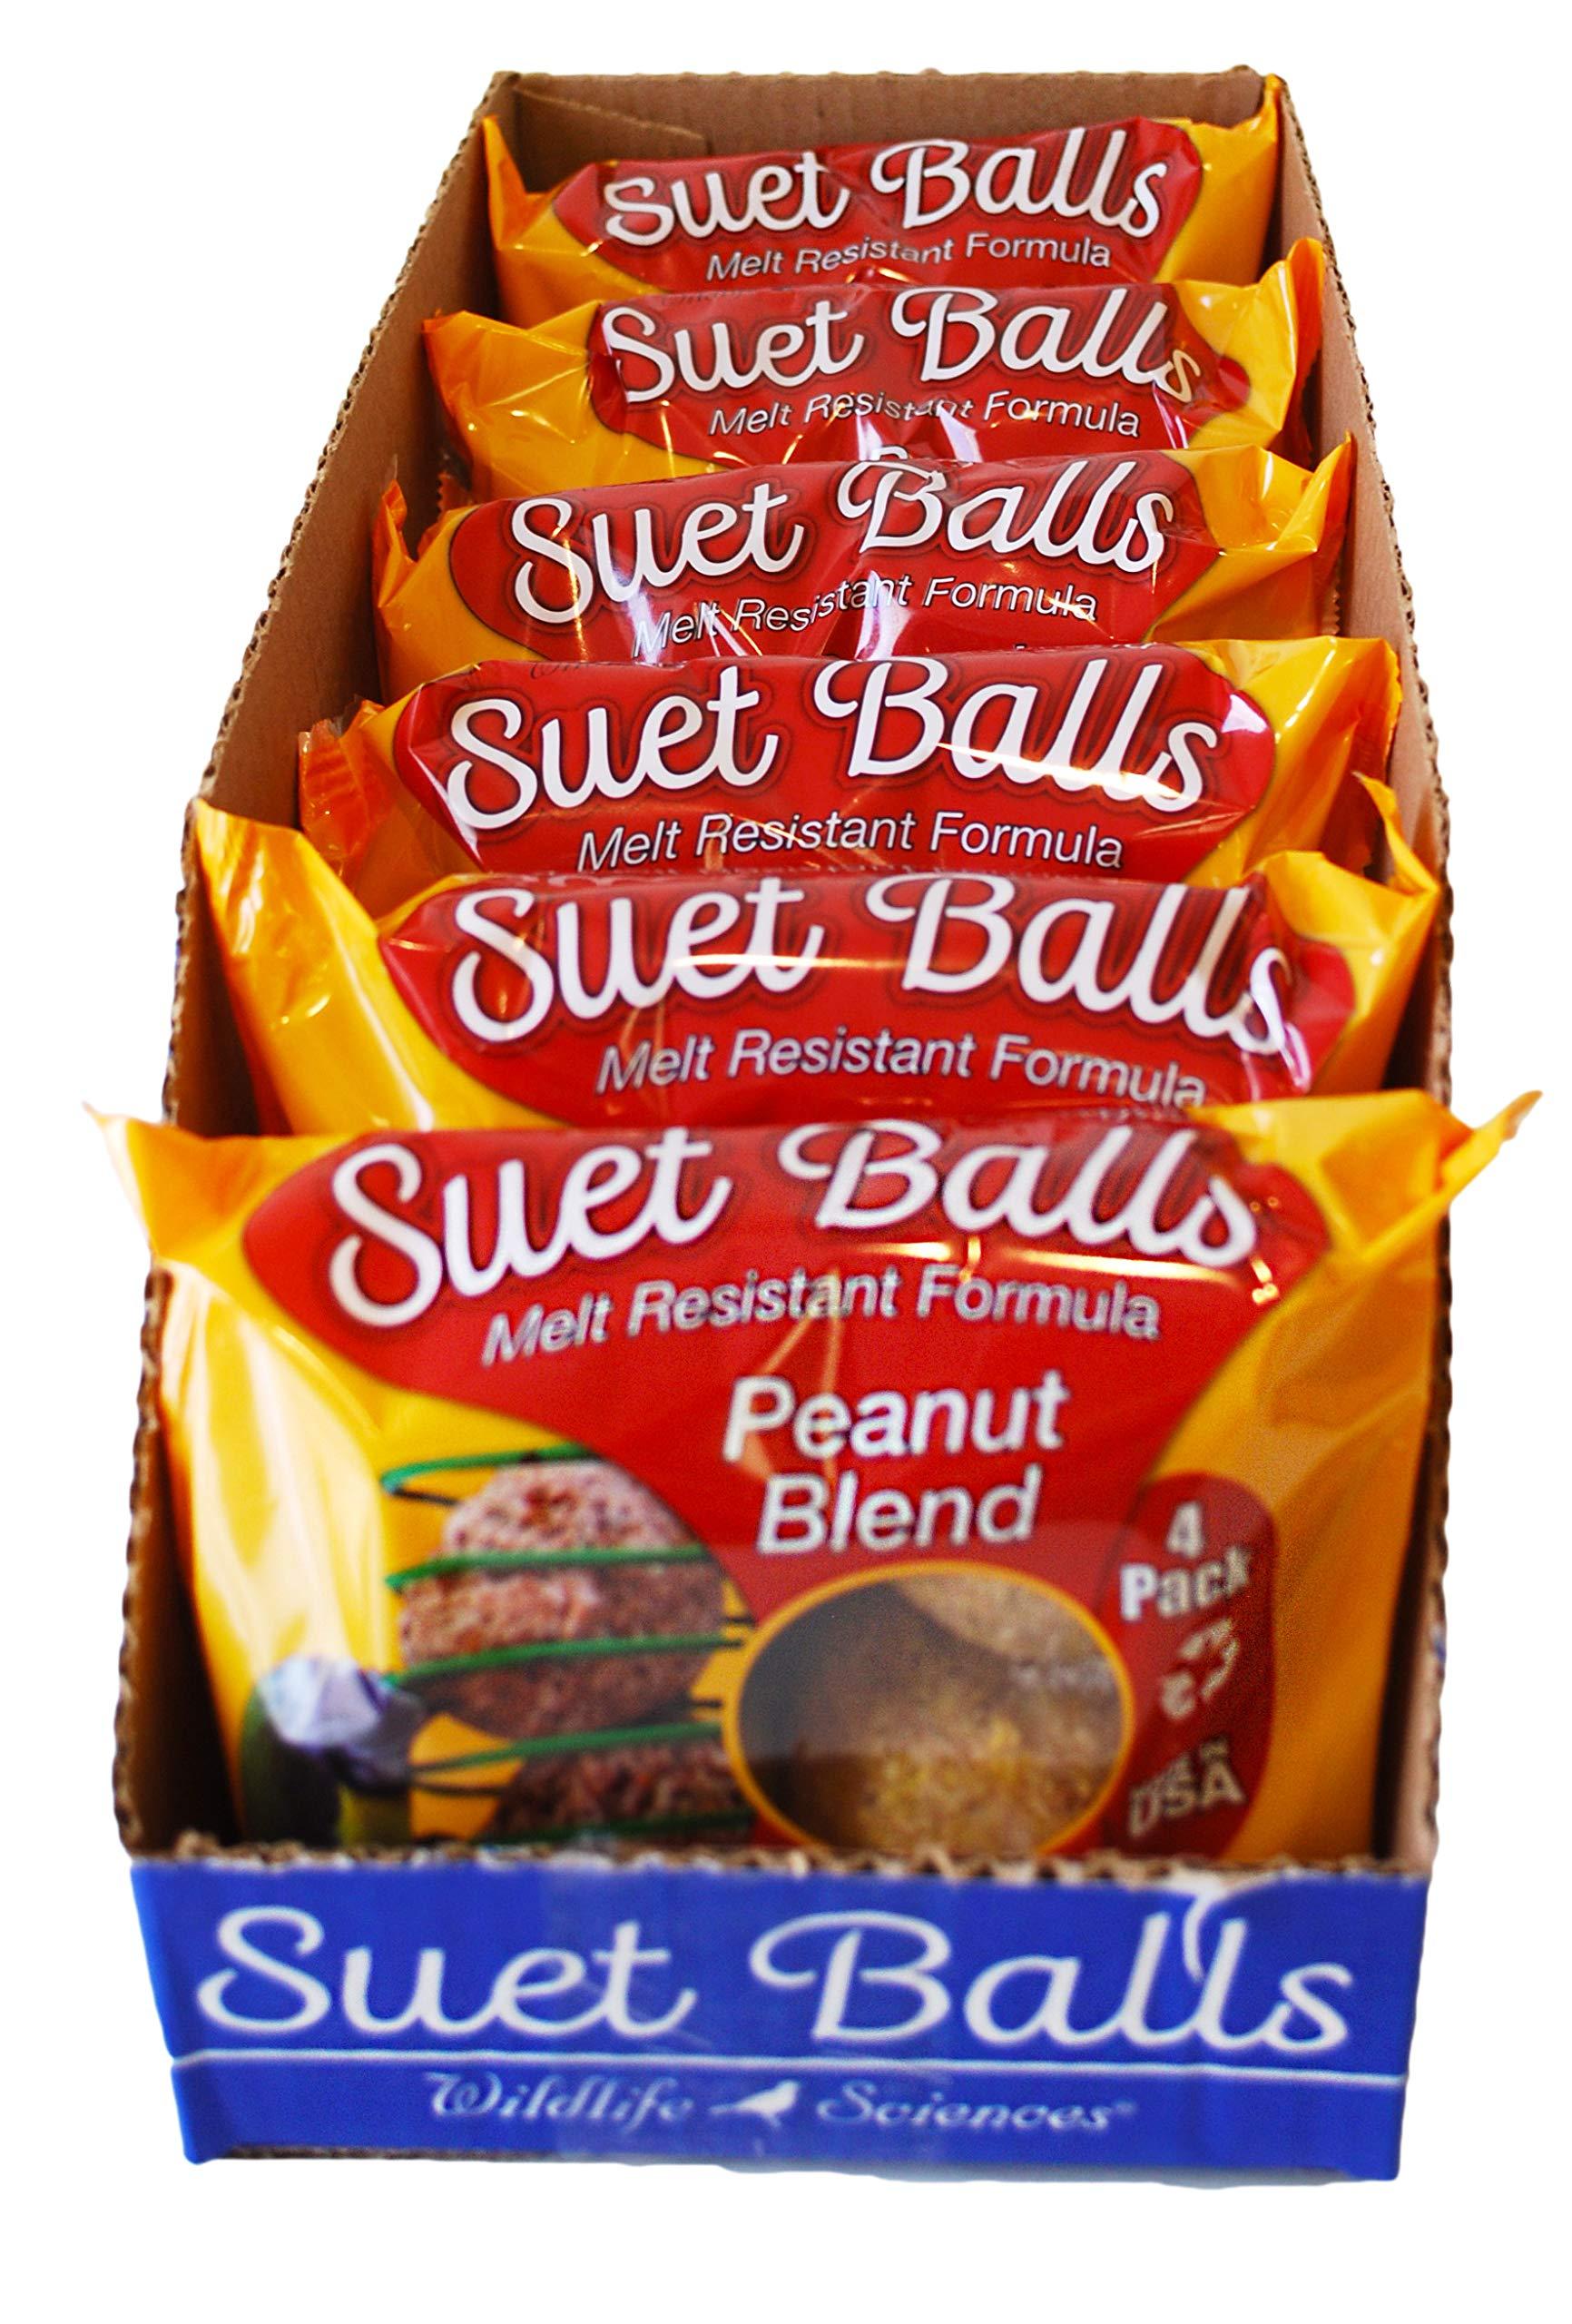 Wildlife Sciences Suet Balls 24 Pack, 6 Individually Wrapped Packs of 4 Bird Suet Balls (Peanut Blend)